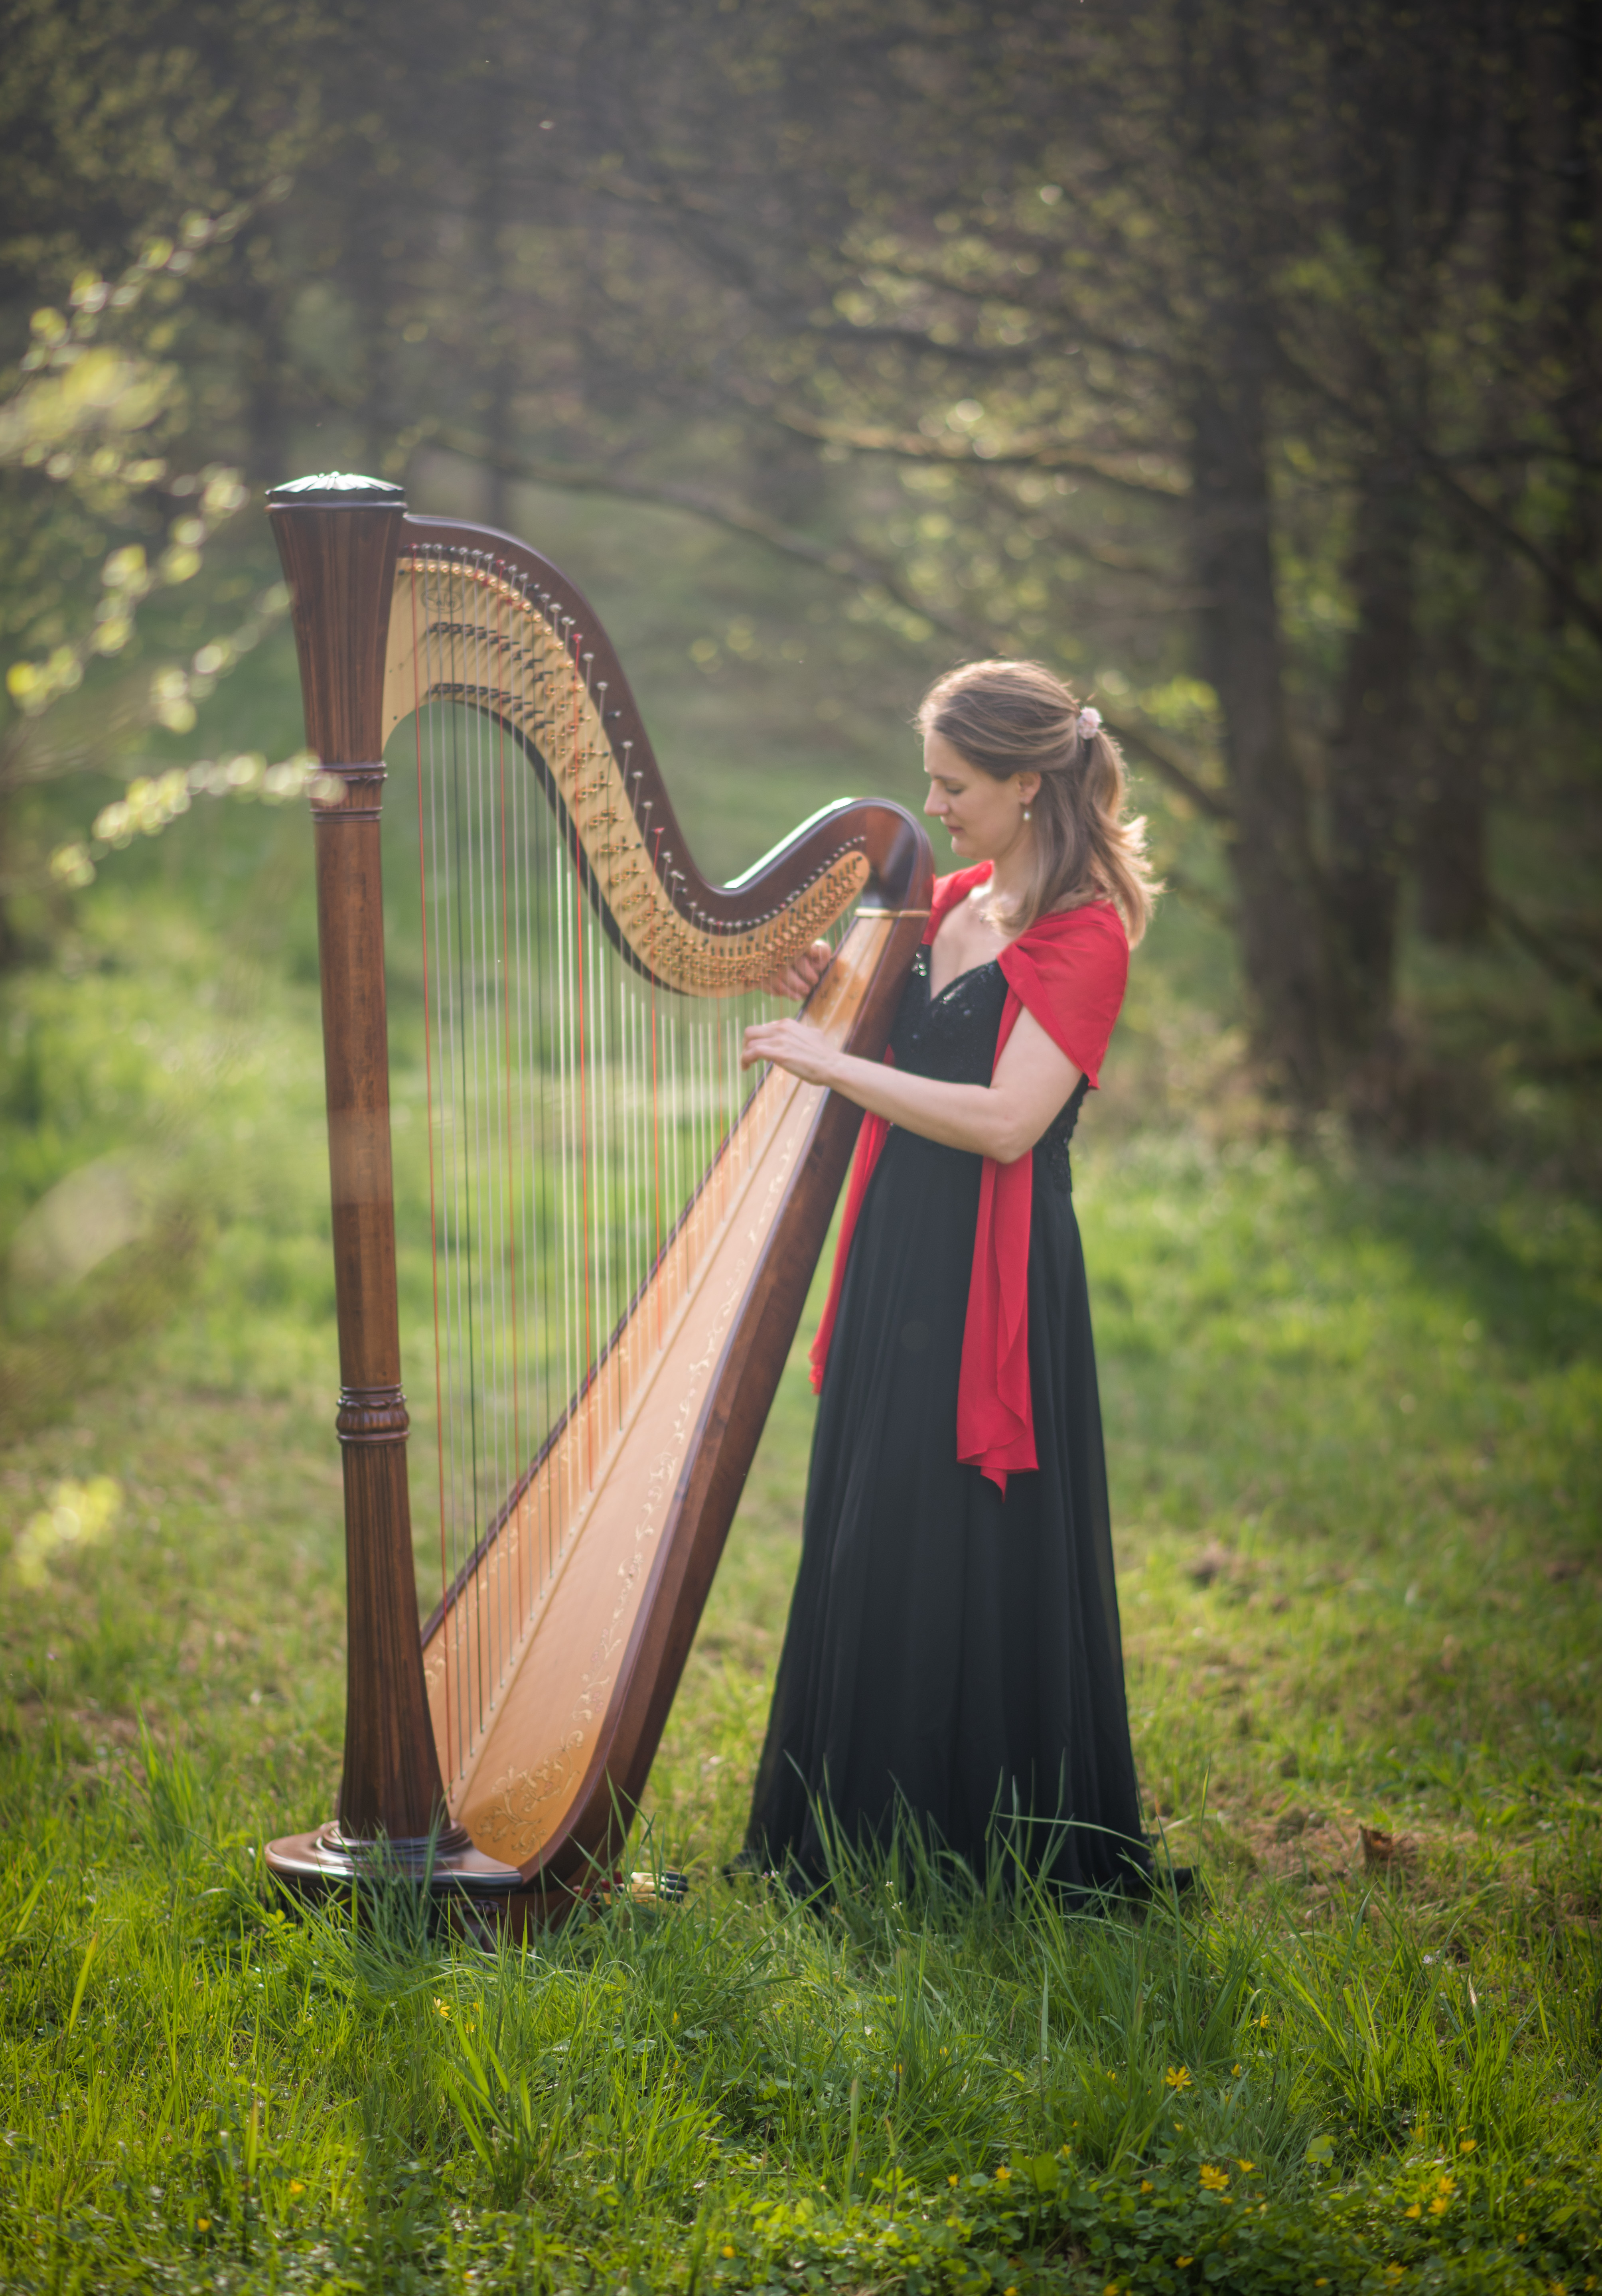 Sonja Fiedler Harfe